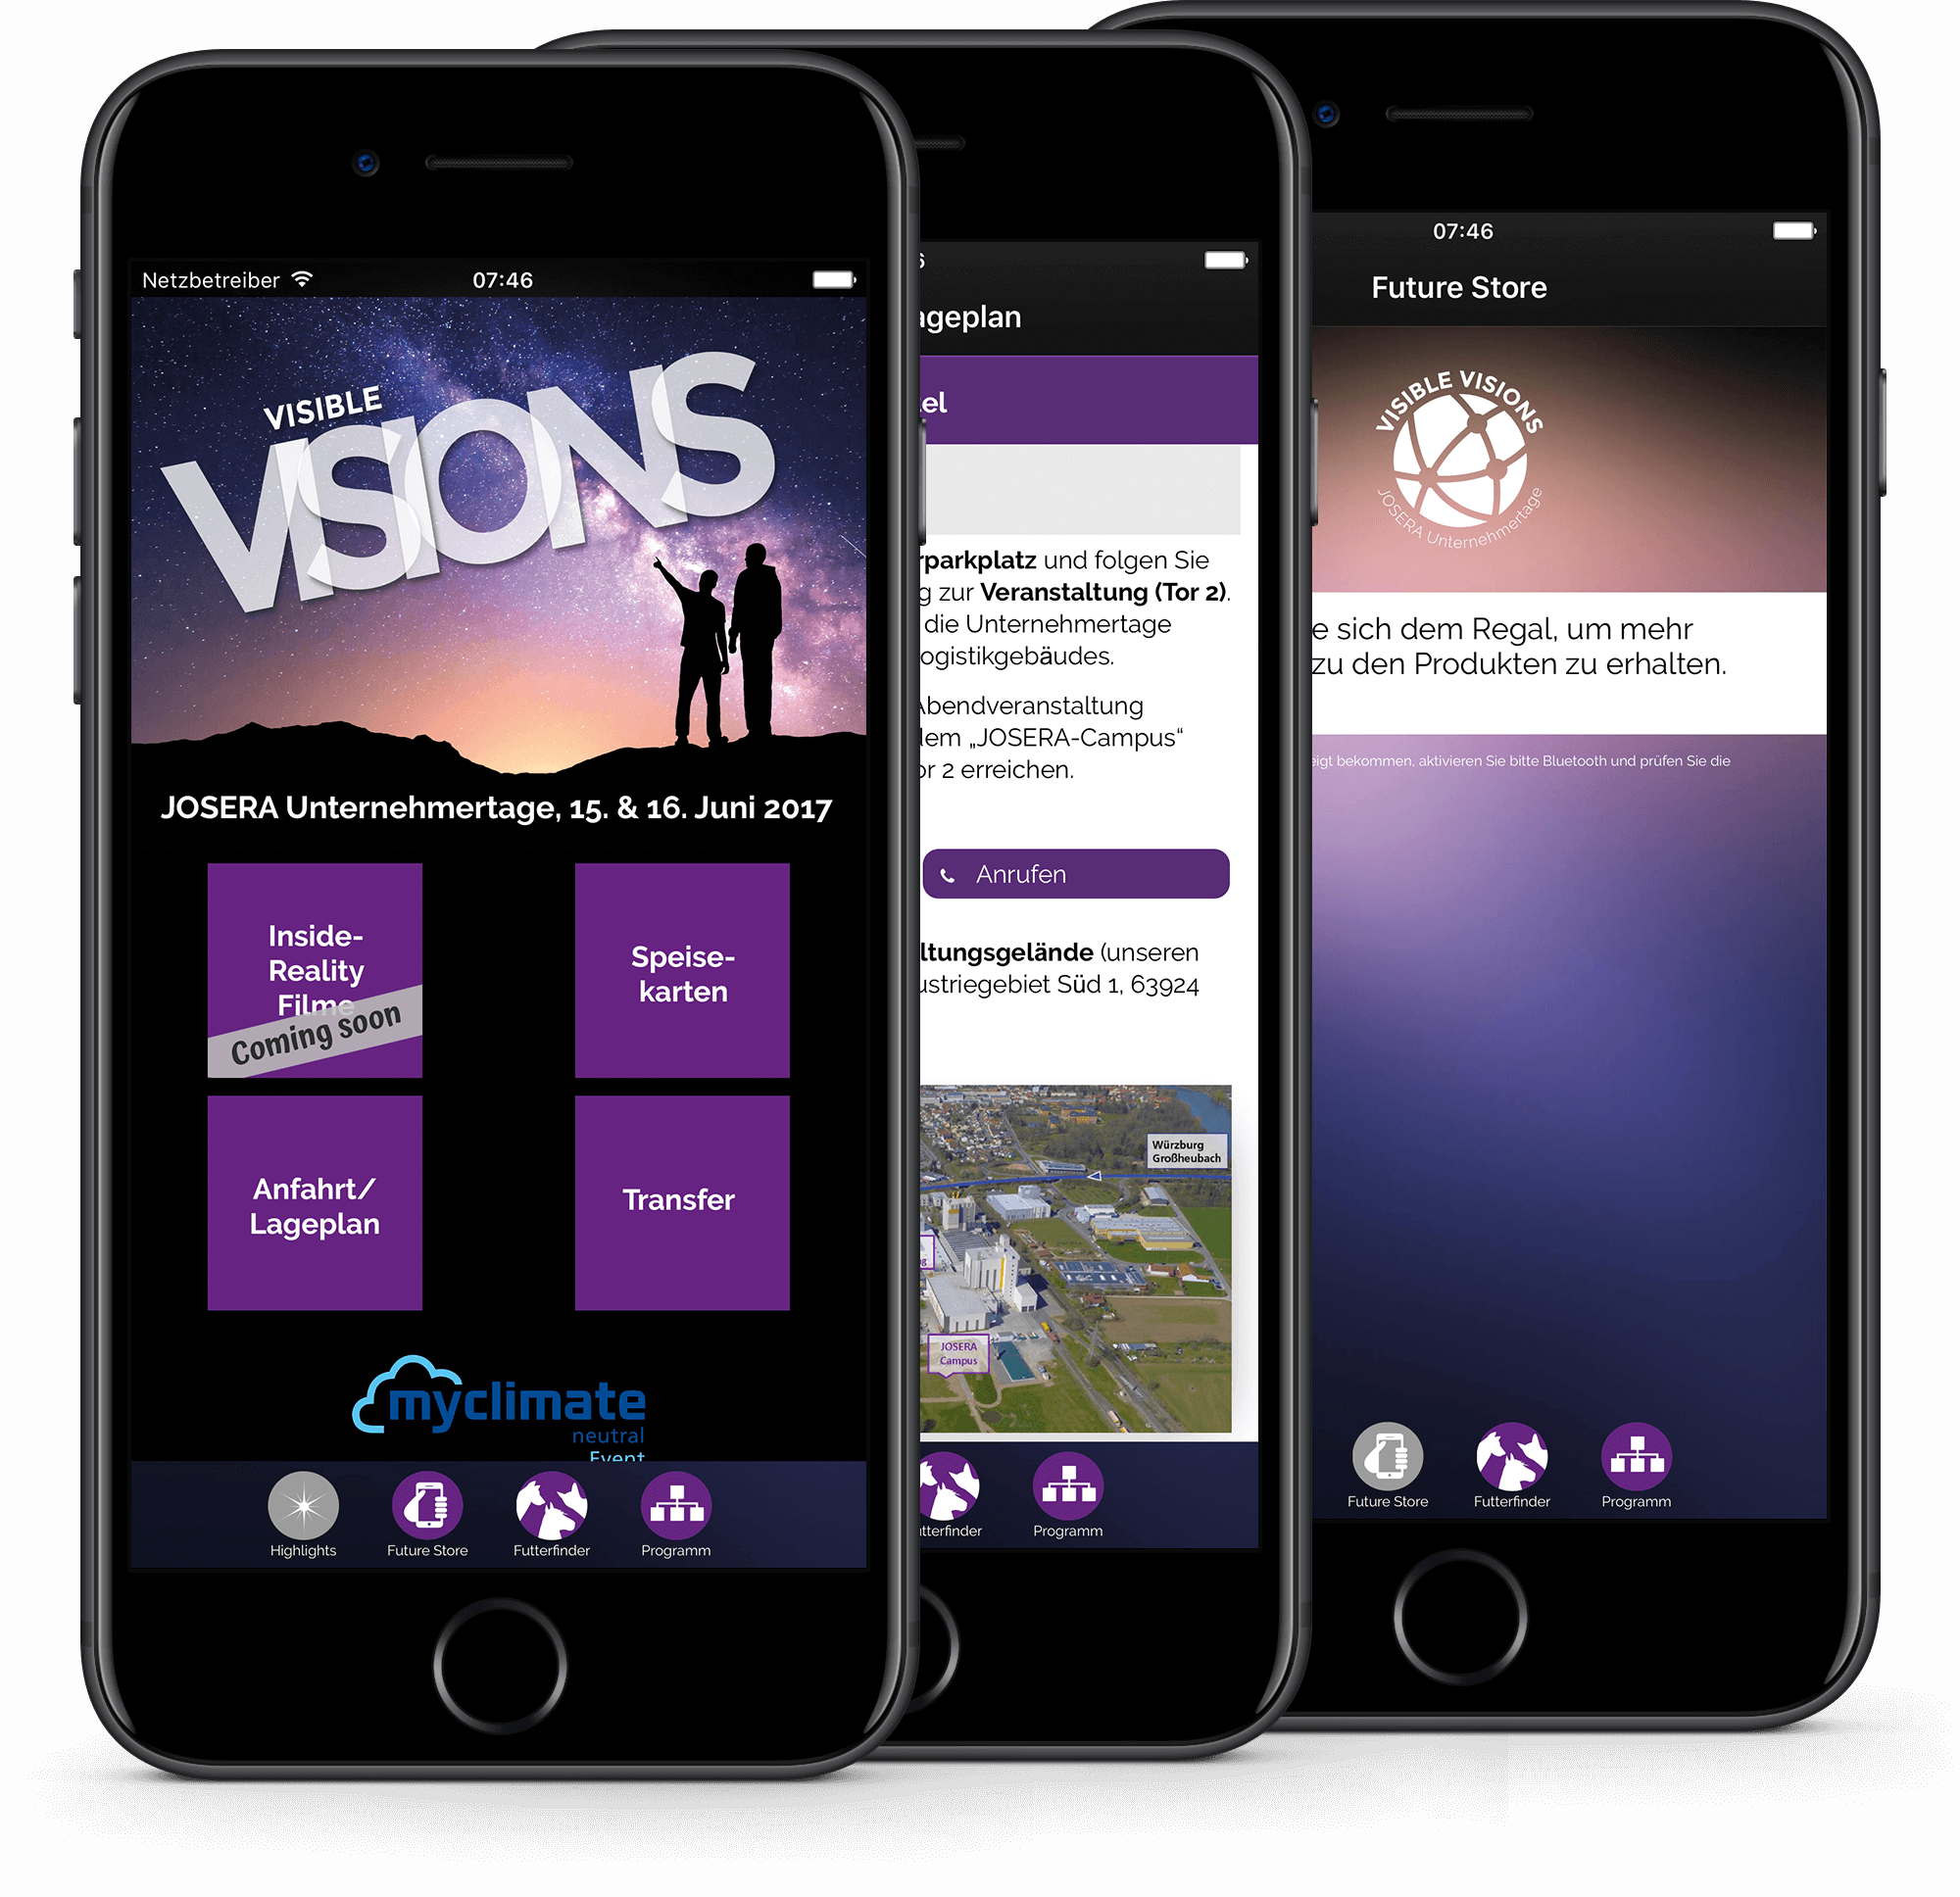 josera-unternehmertage-app-ios-android.png